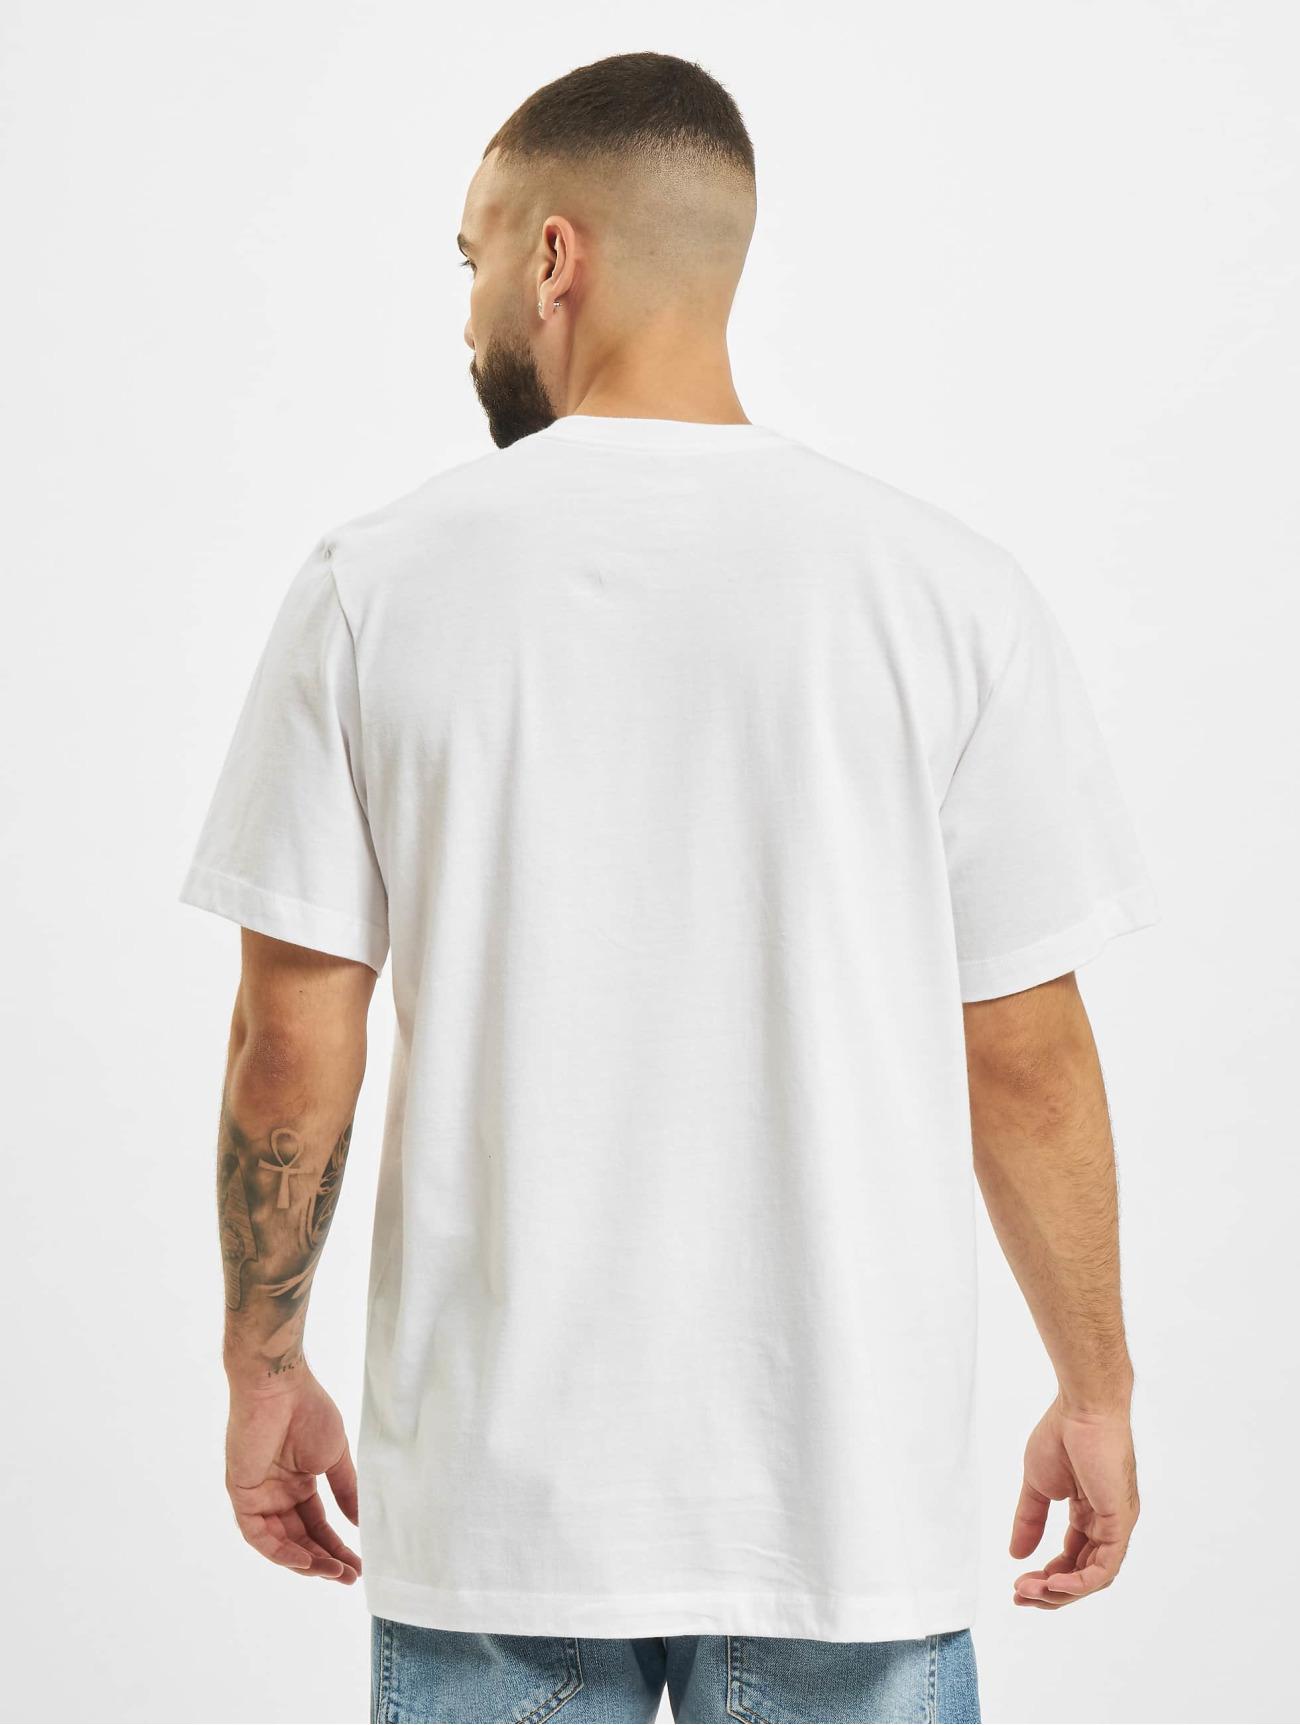 Nike   JustDo  blanc Homme T-Shirt  587353  Homme Hauts